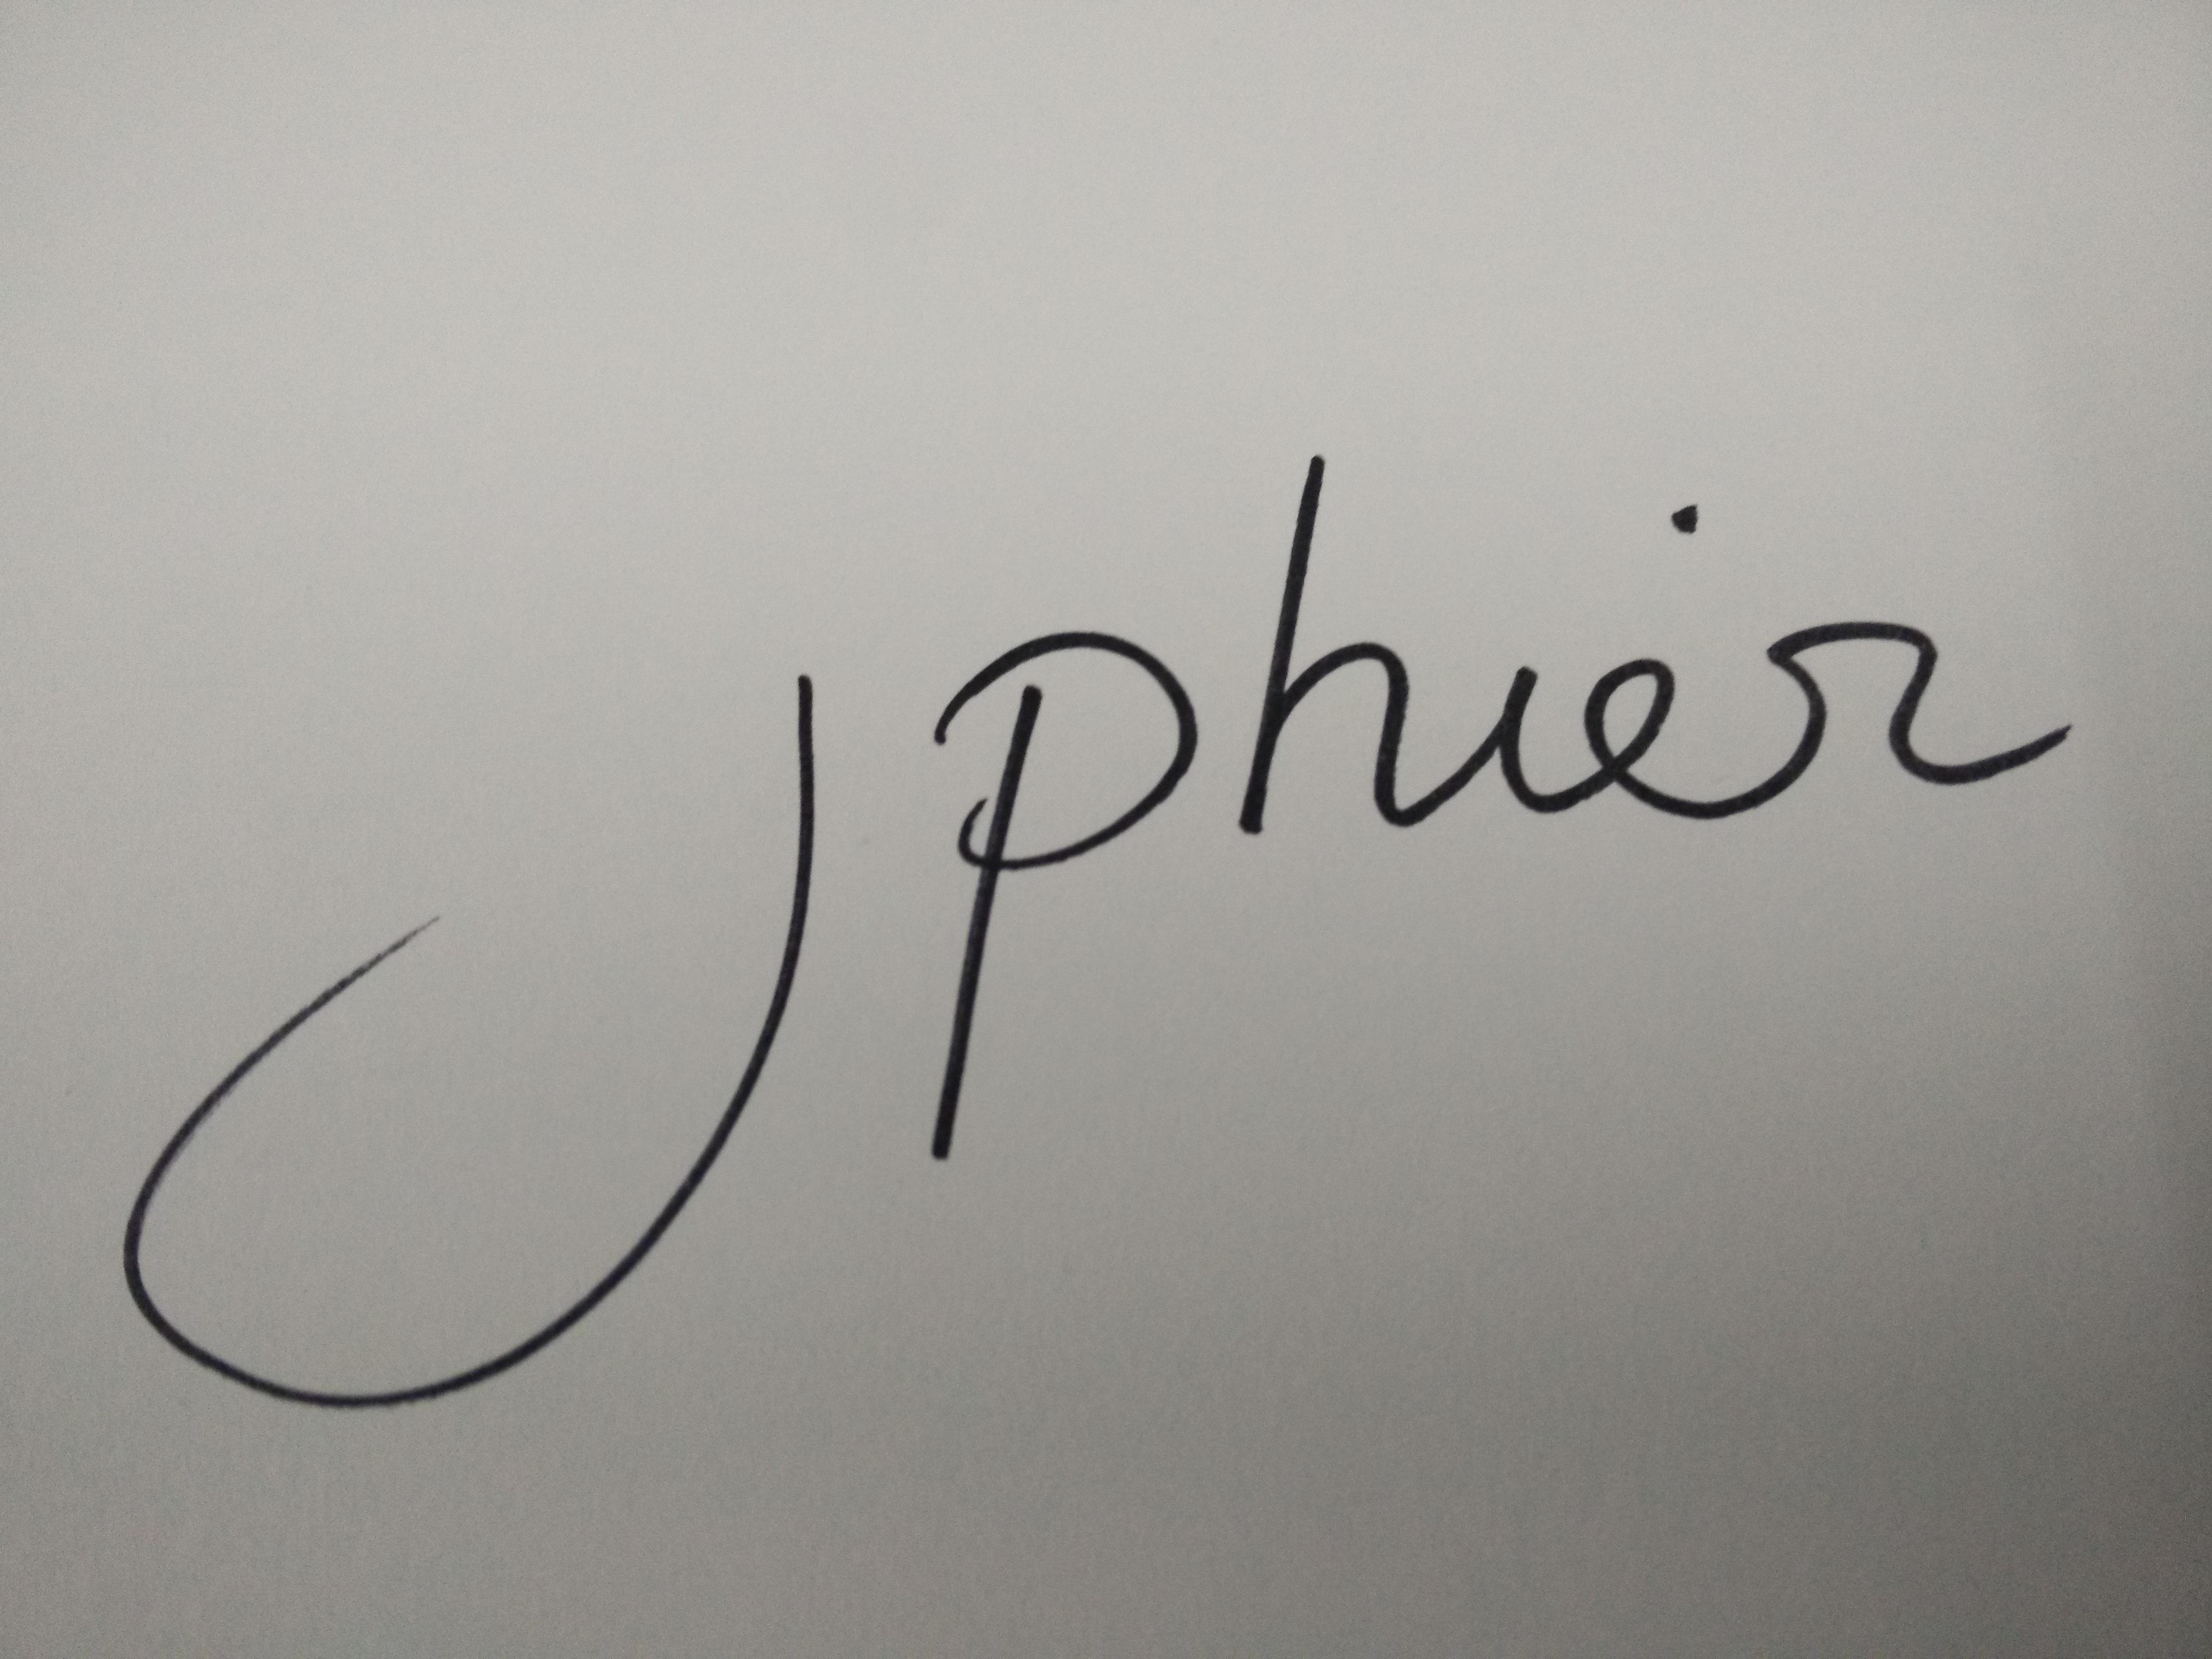 jphier's Signature